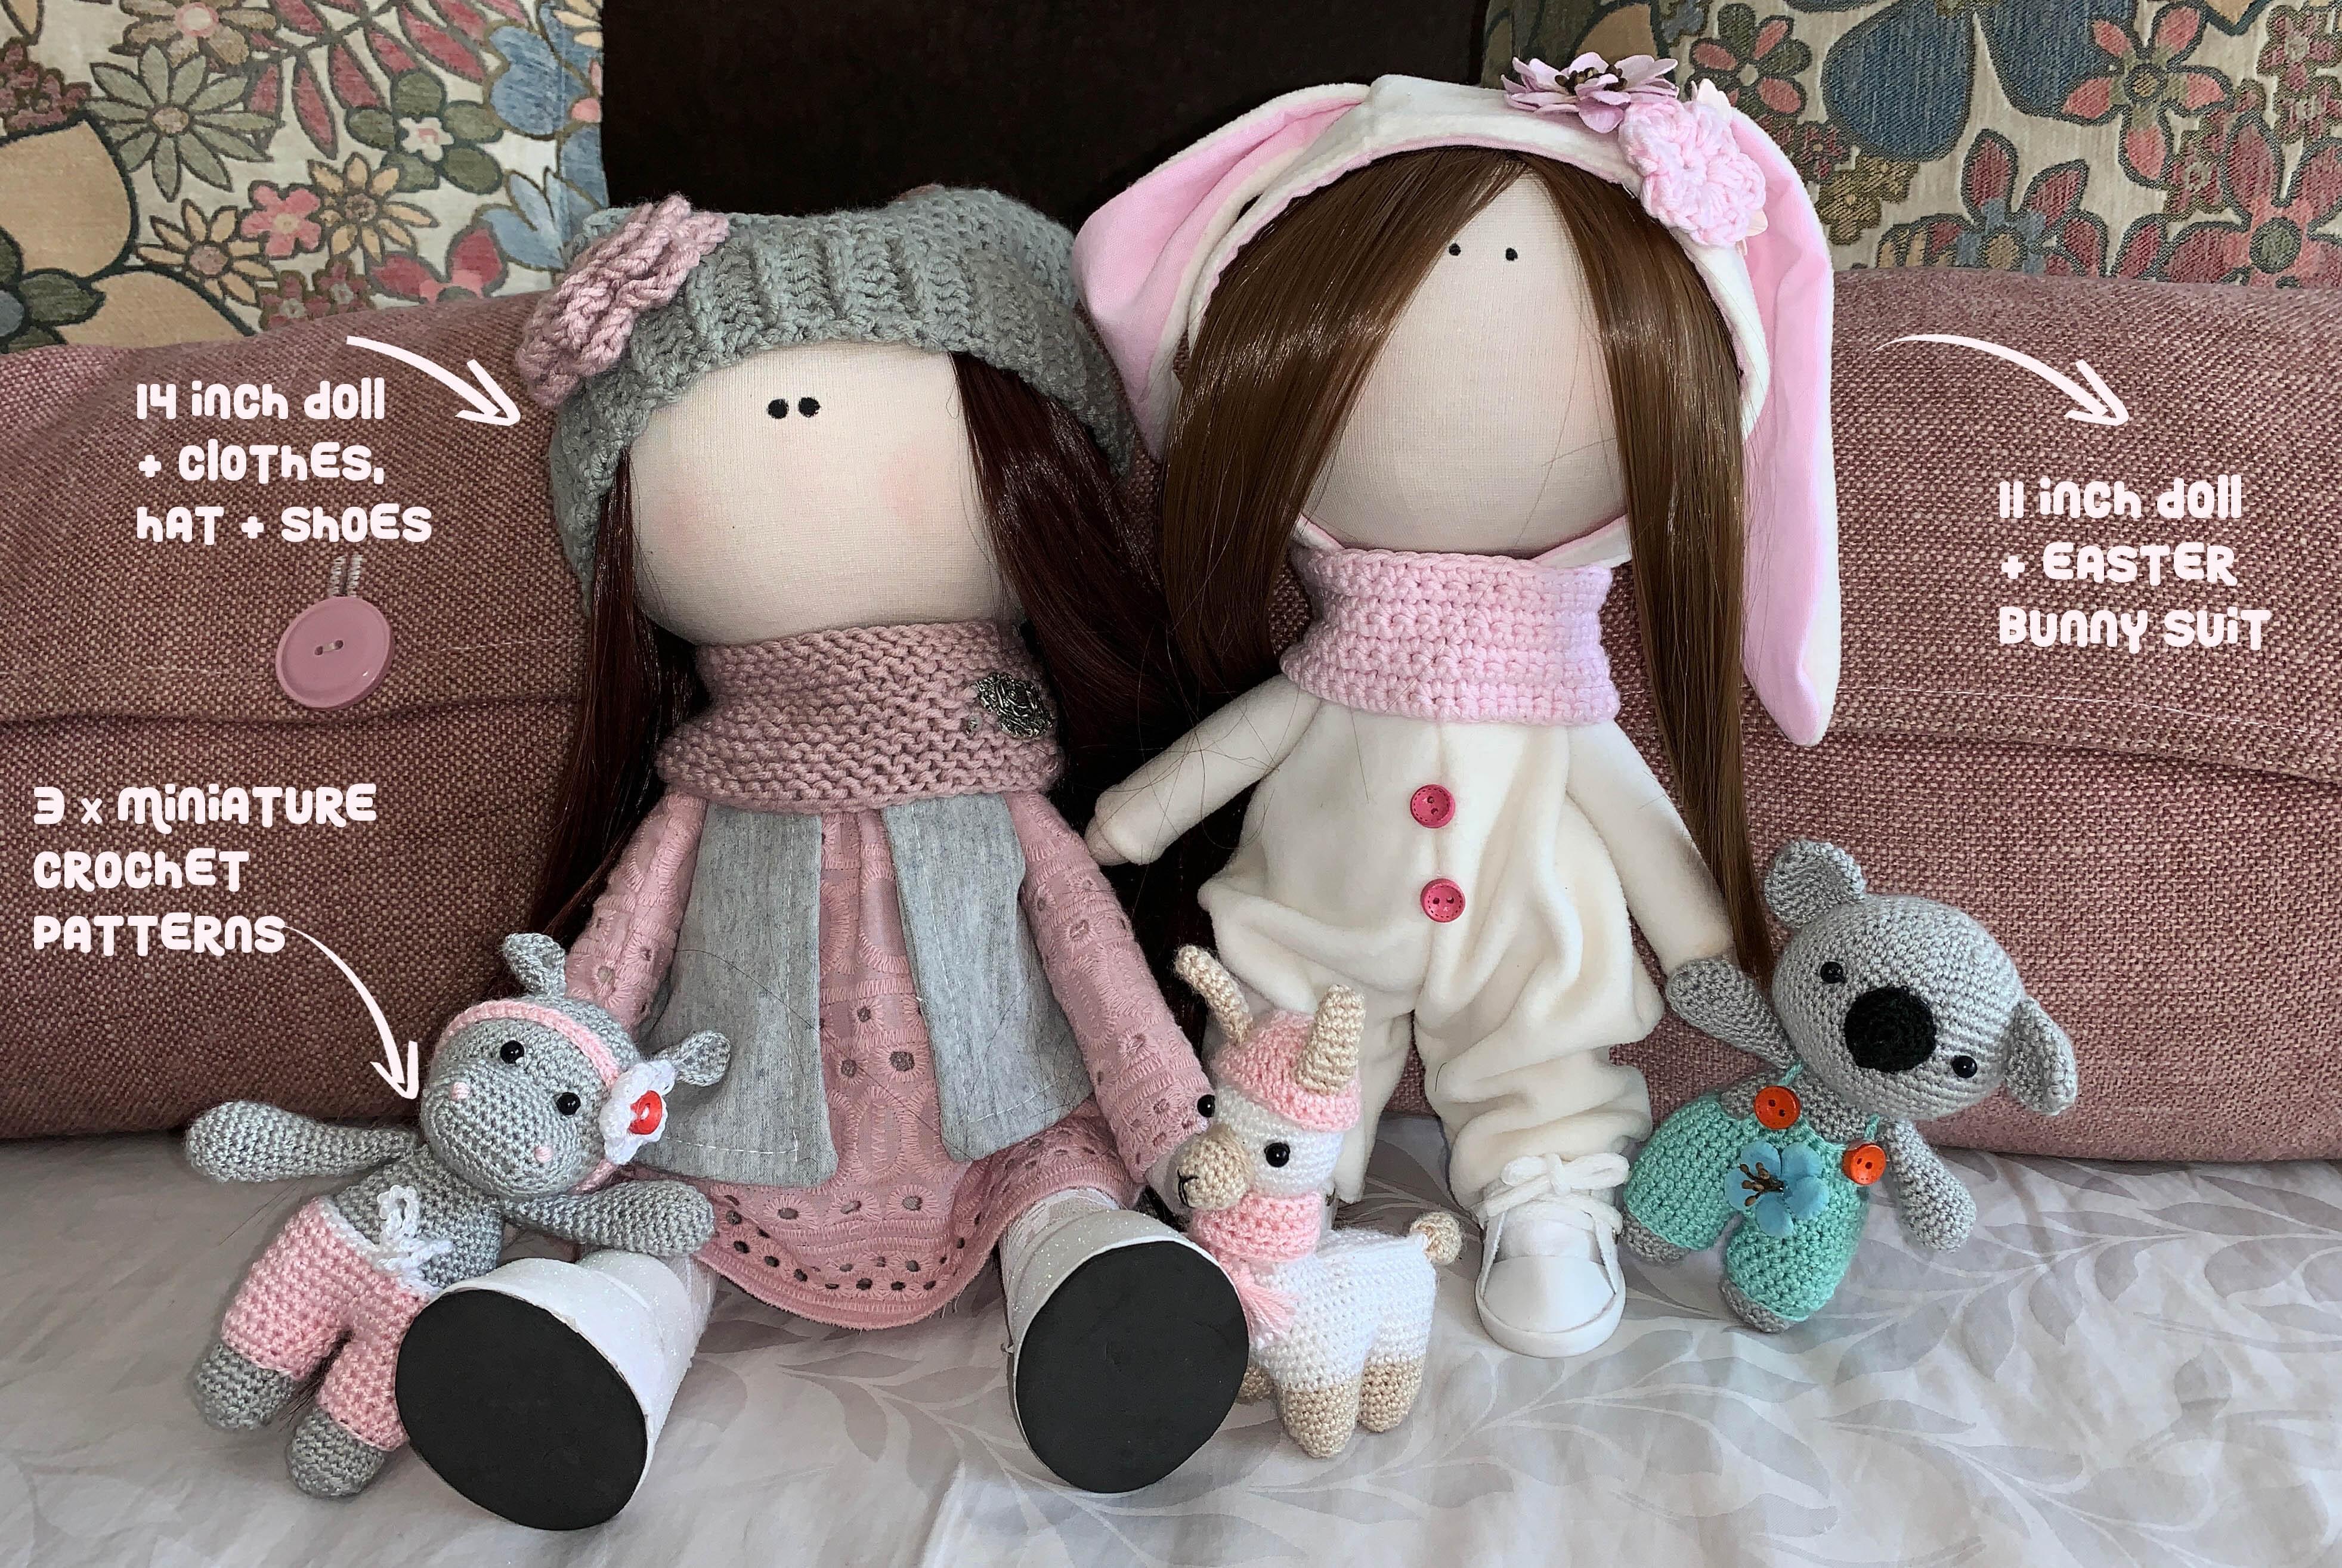 How to Attach Hair to a Crochet Doll - thefriendlyredfox.com | 2630x3927